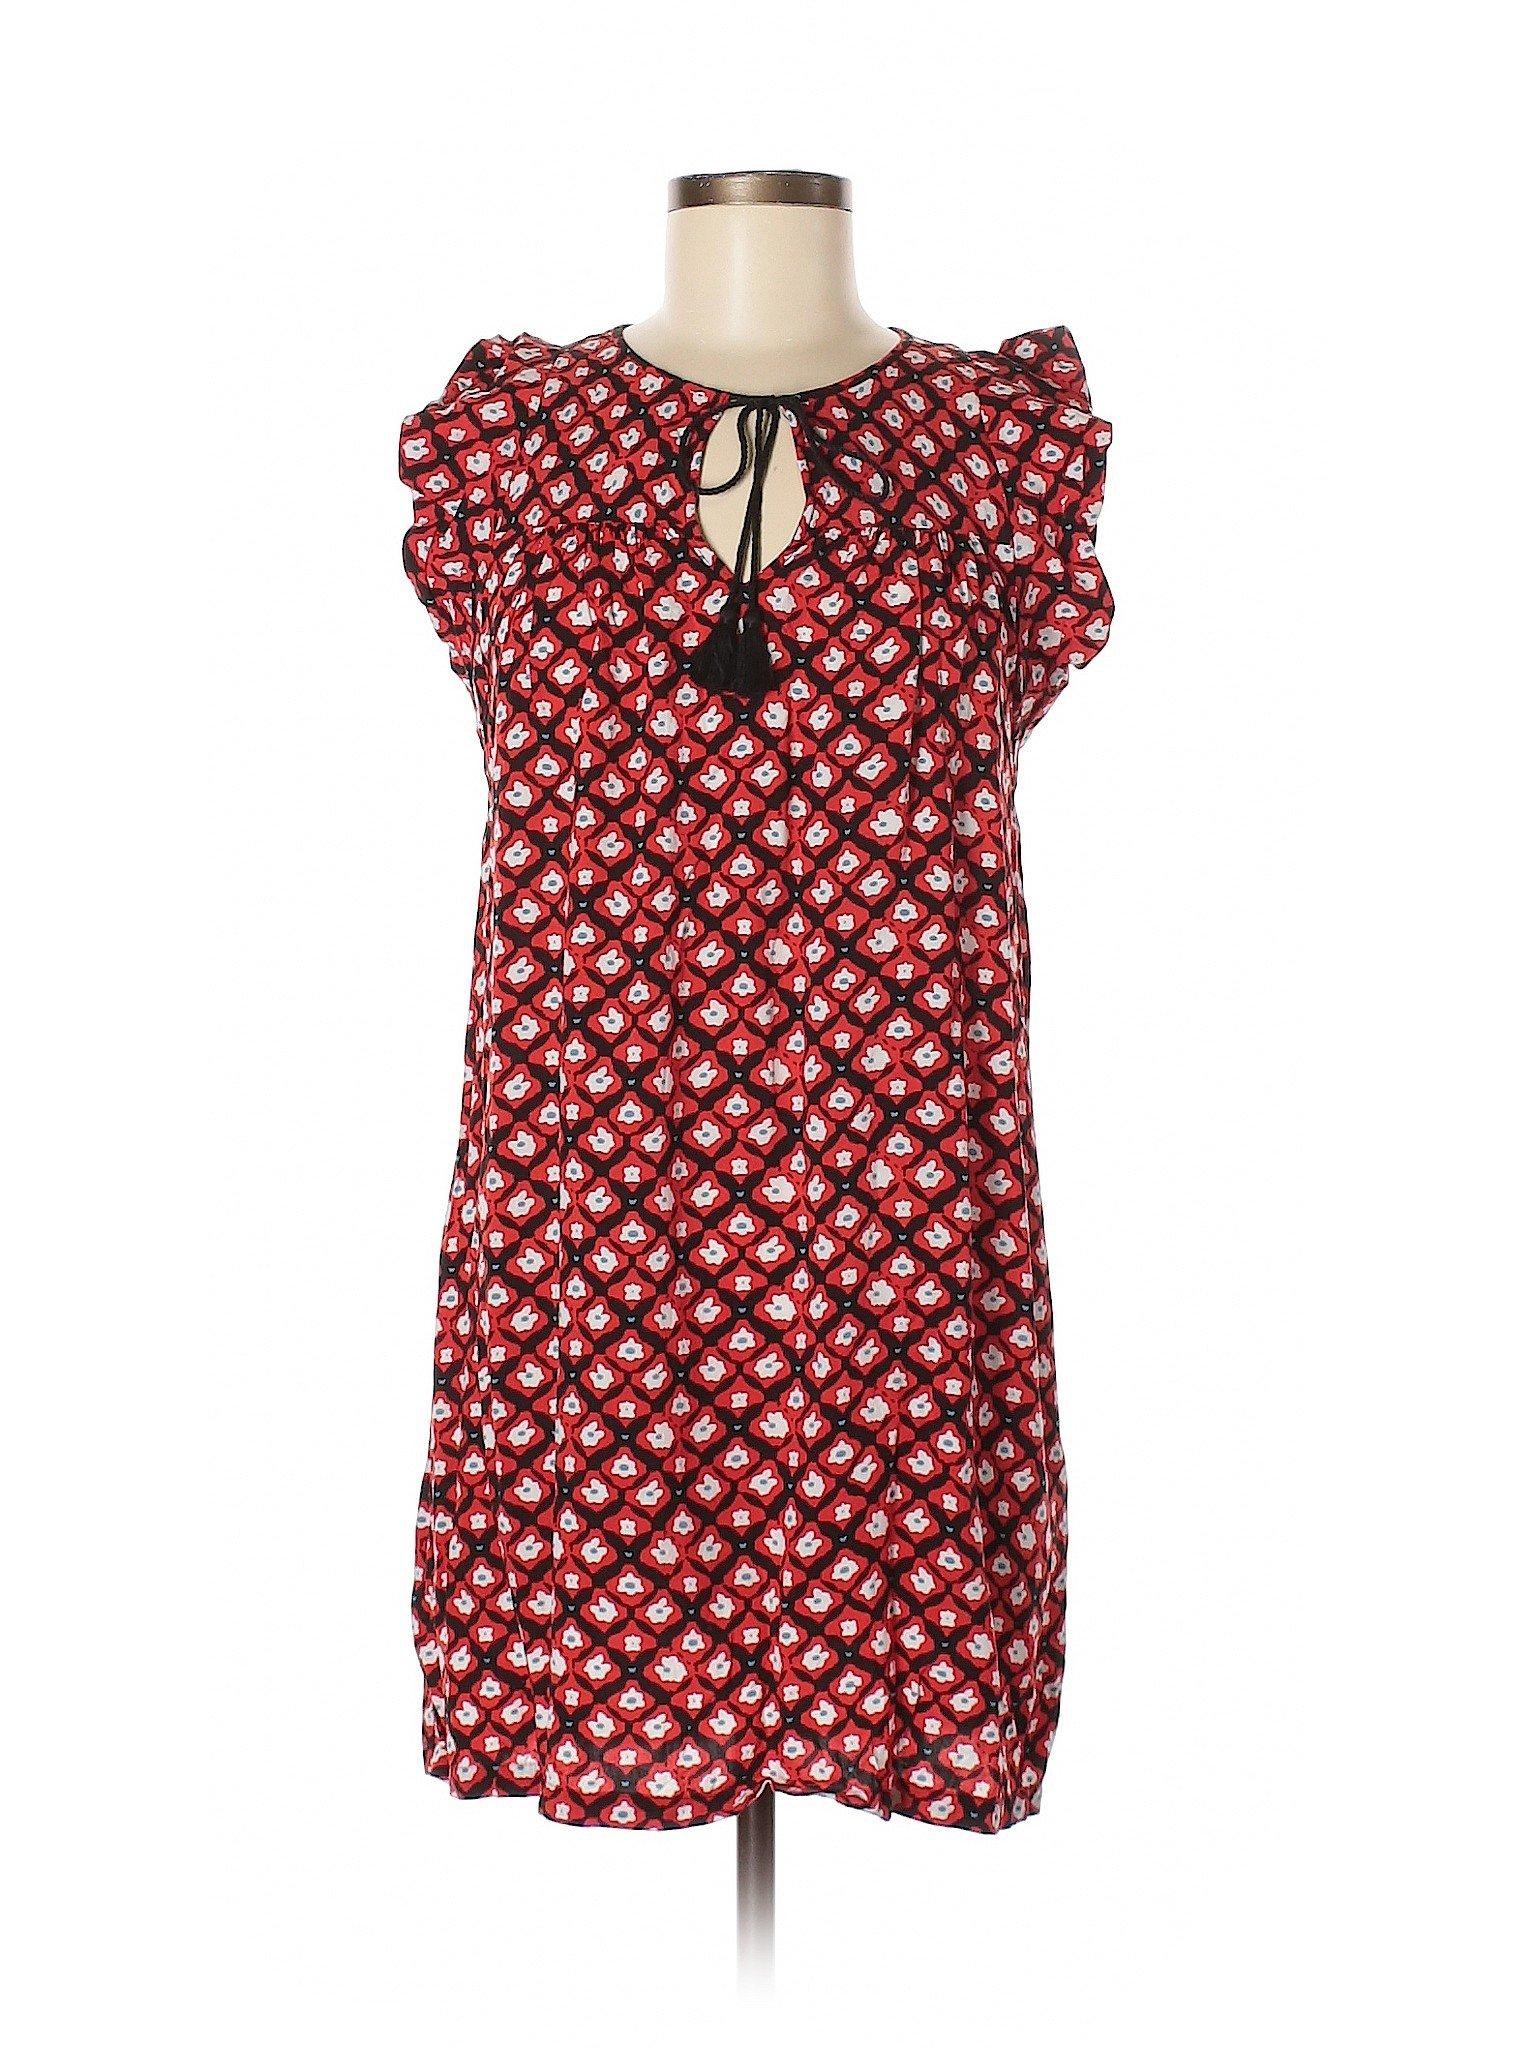 Ann Casual Taylor Dress Selling LOFT Xqw8Txdwtn